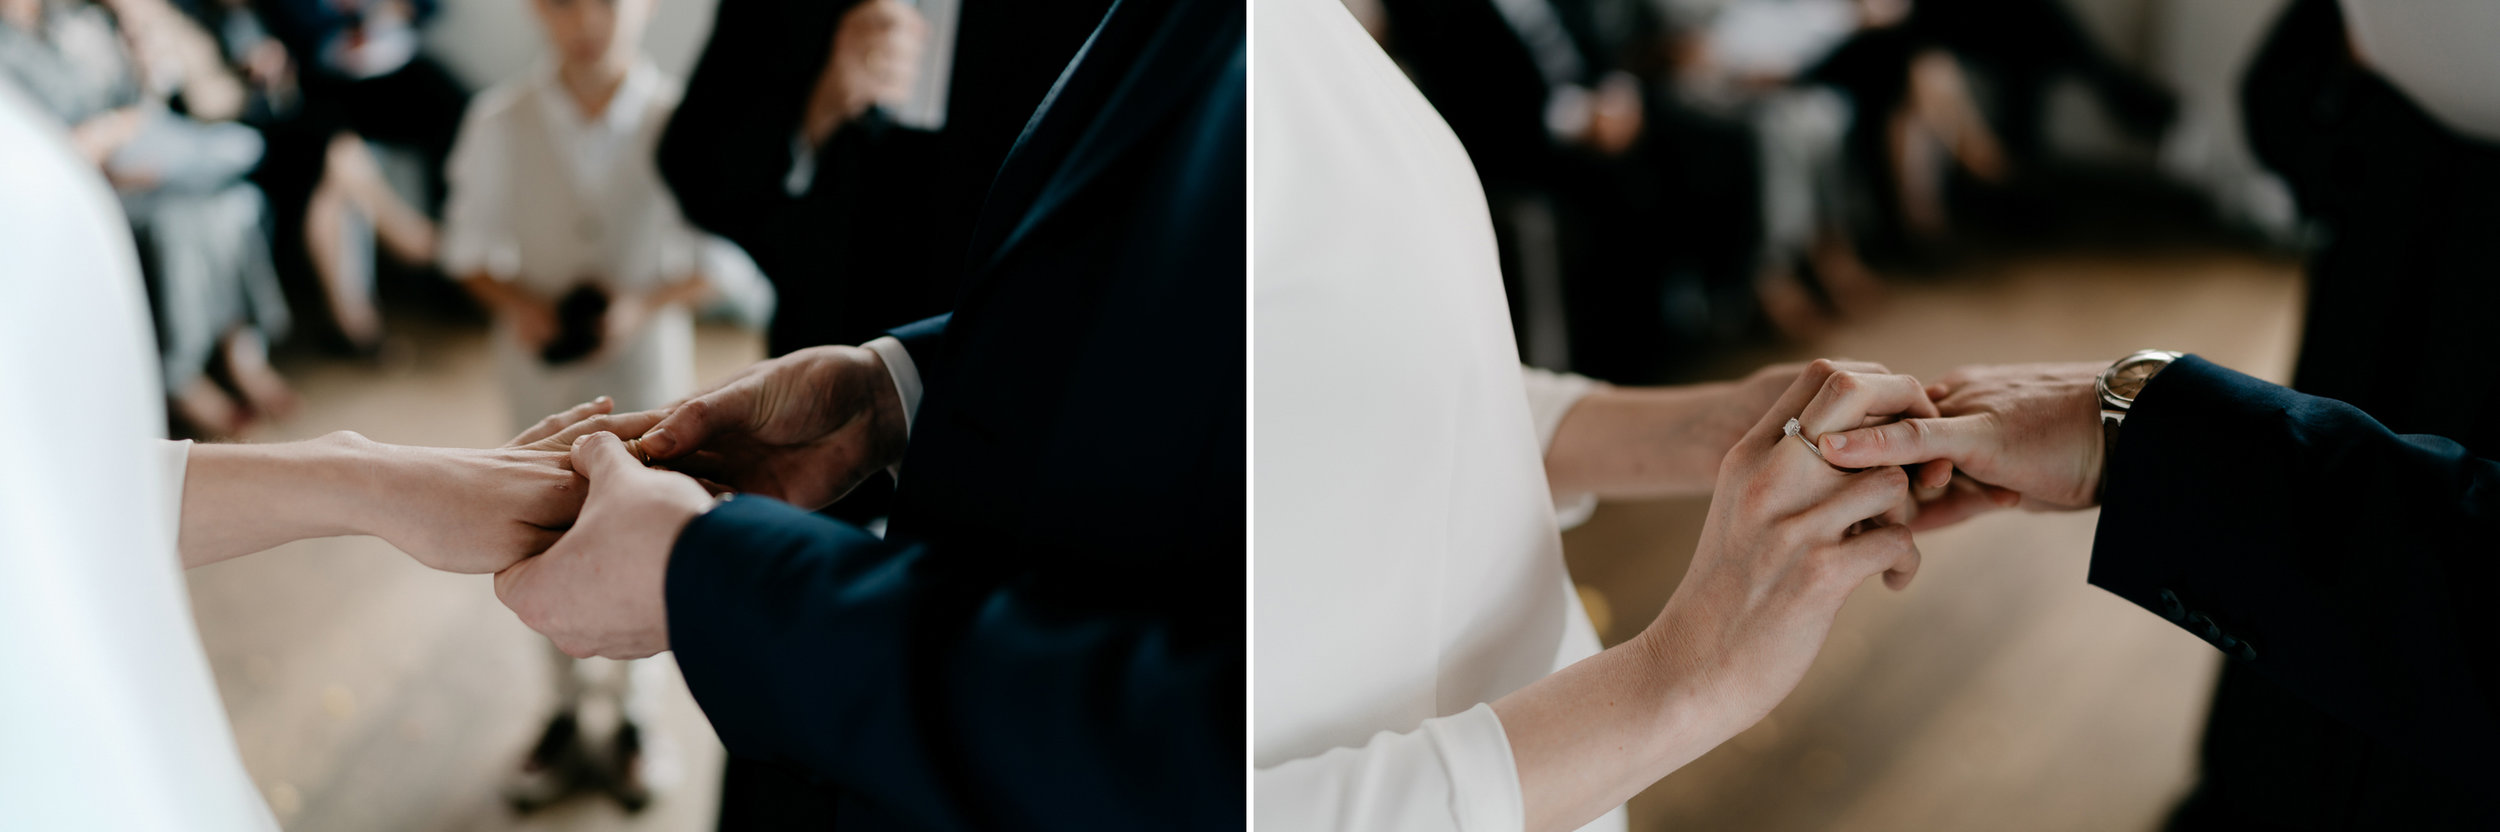 bruidsfotografie-trouwfotograaf-wedding-photographer-amsterdam-James-Jantine-176 copy.jpg